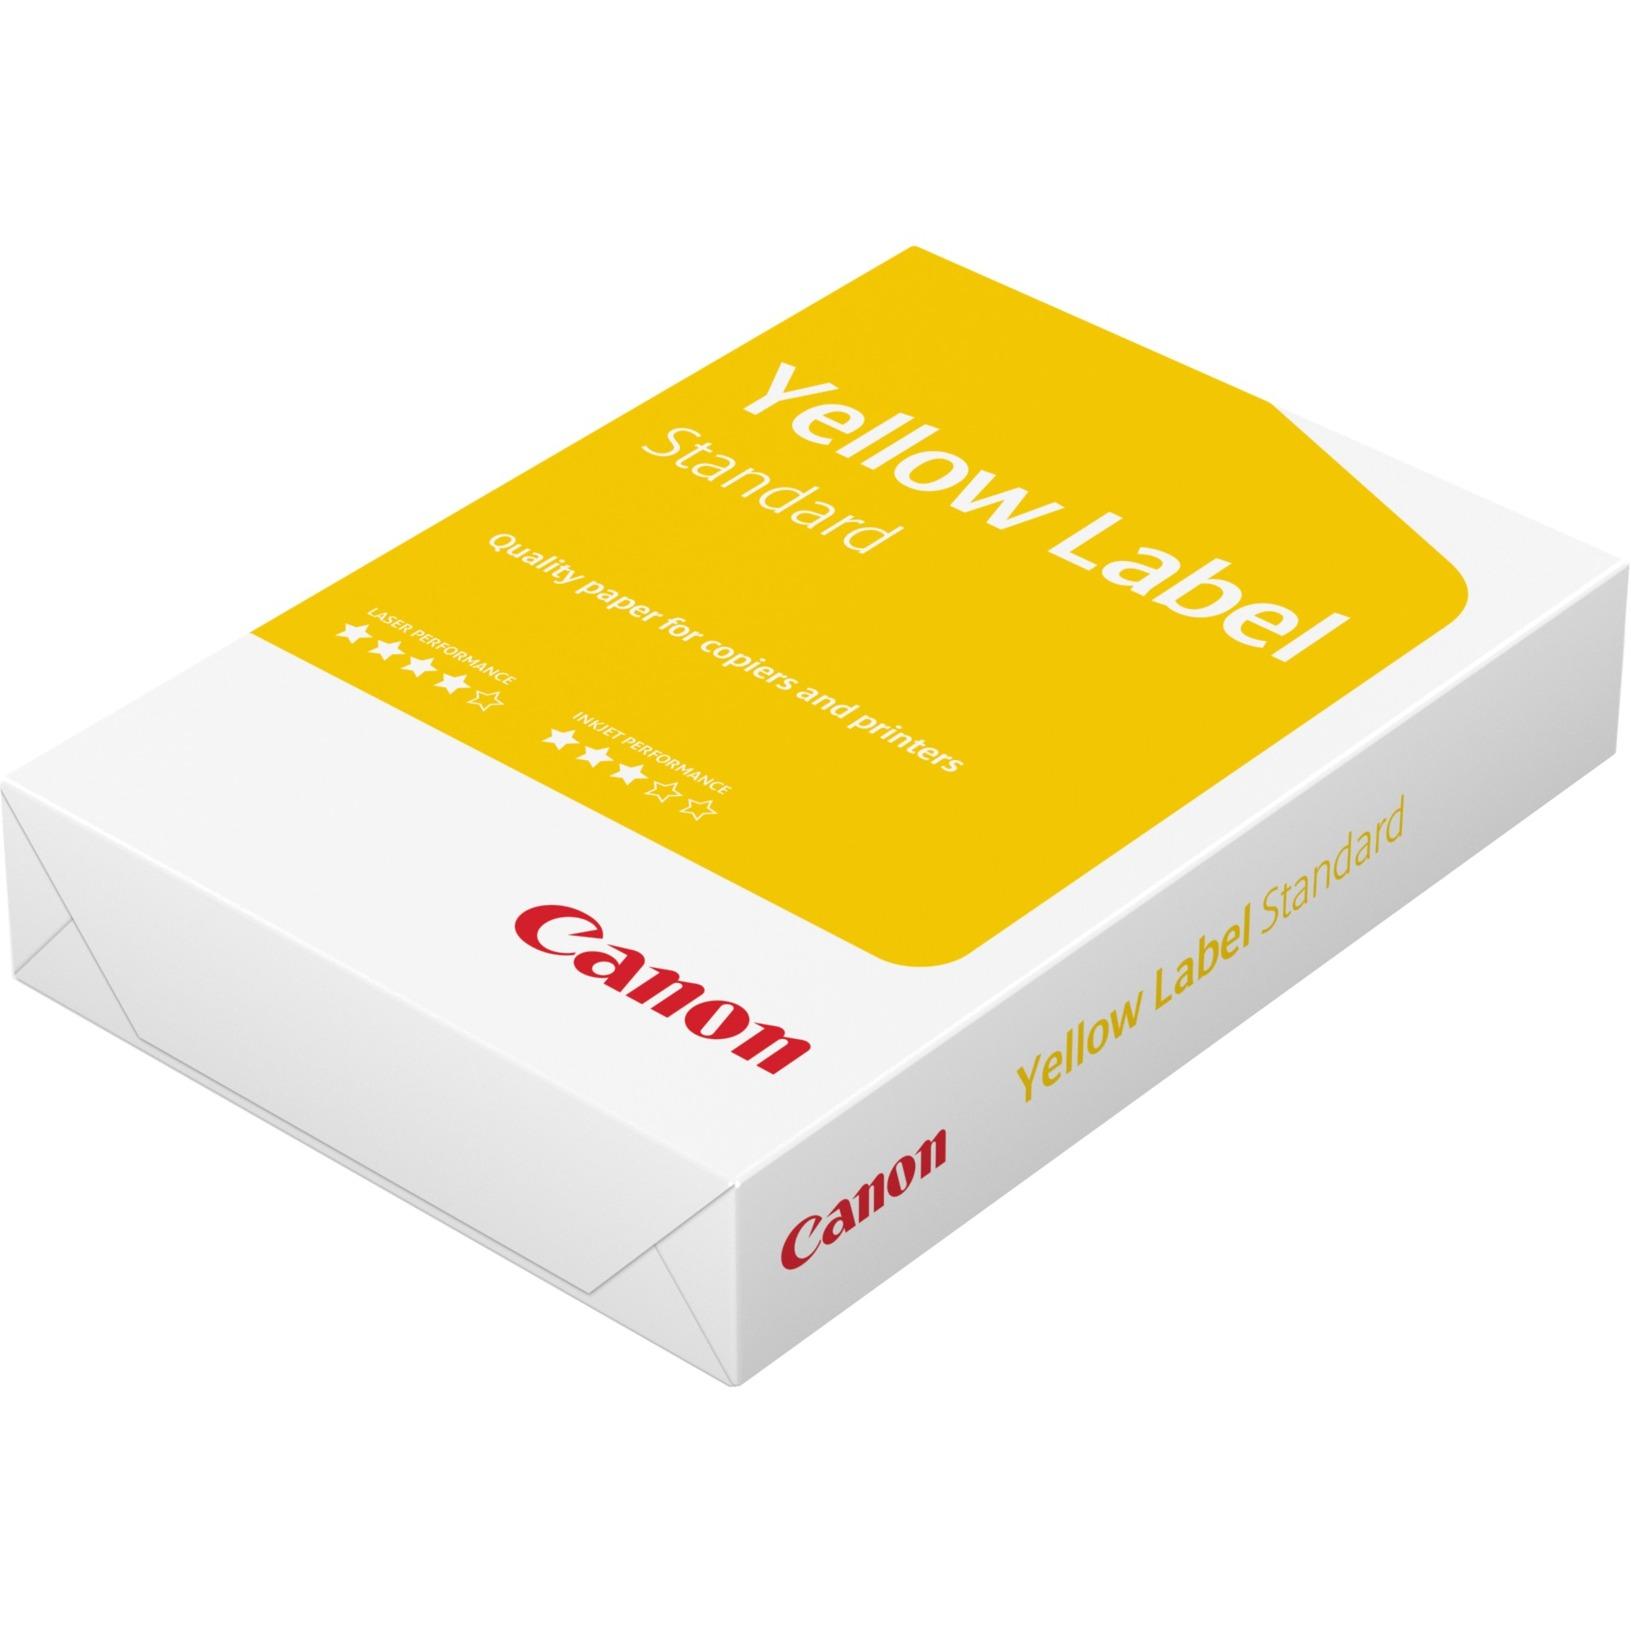 Canon Yellow Label Print Papel Para Impresora De Inyeccin Tinta G Series A4 210x297 Mm Blanco Impresin Lser